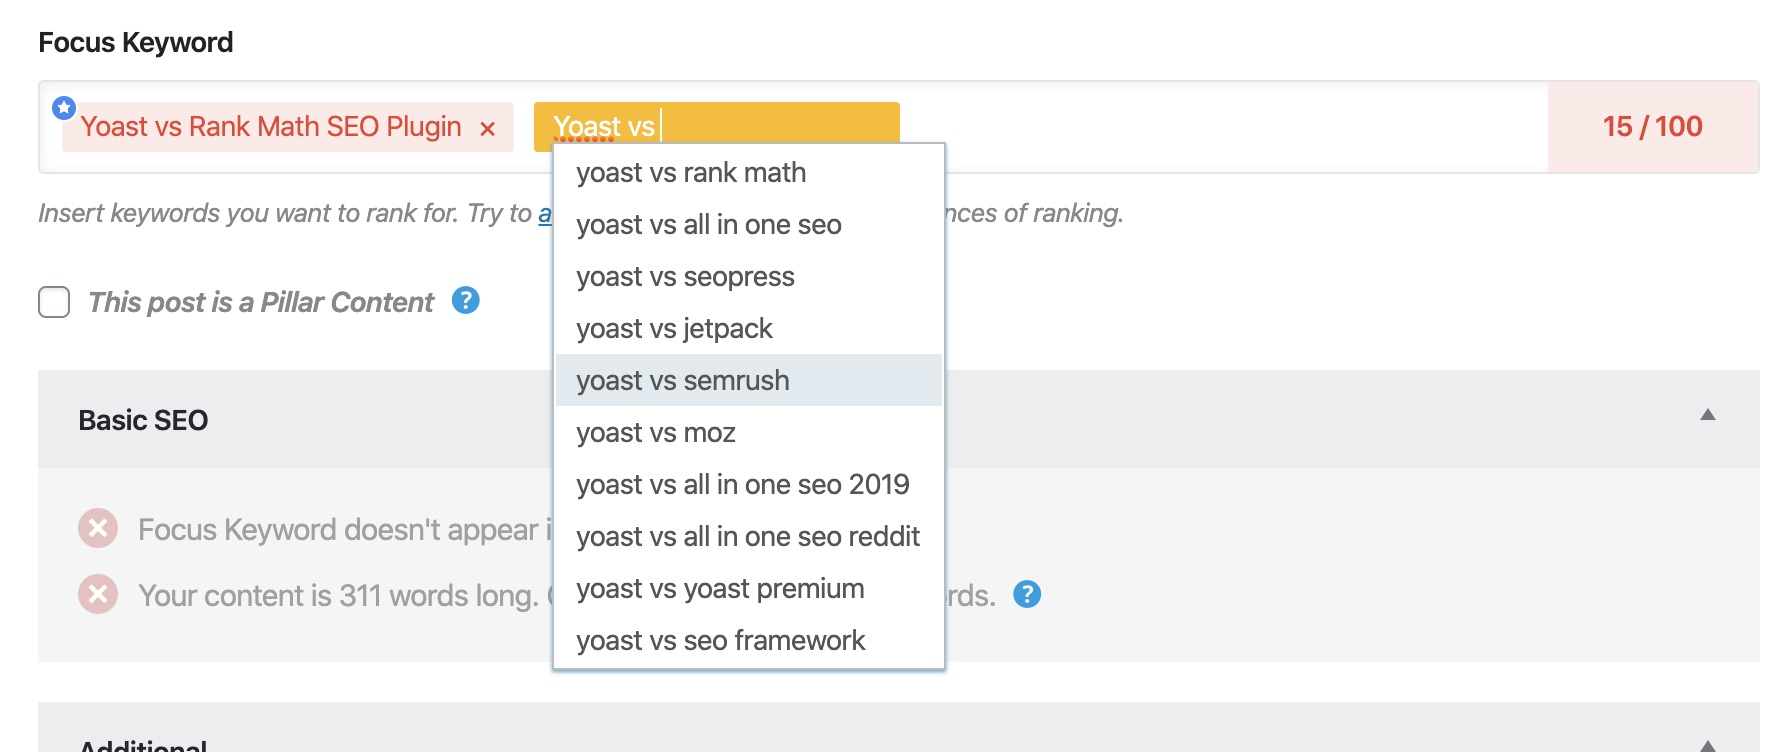 Plugin Yoast vs Rank Math SEO vs All In One SEO - Cái nào tốt hơn? 7